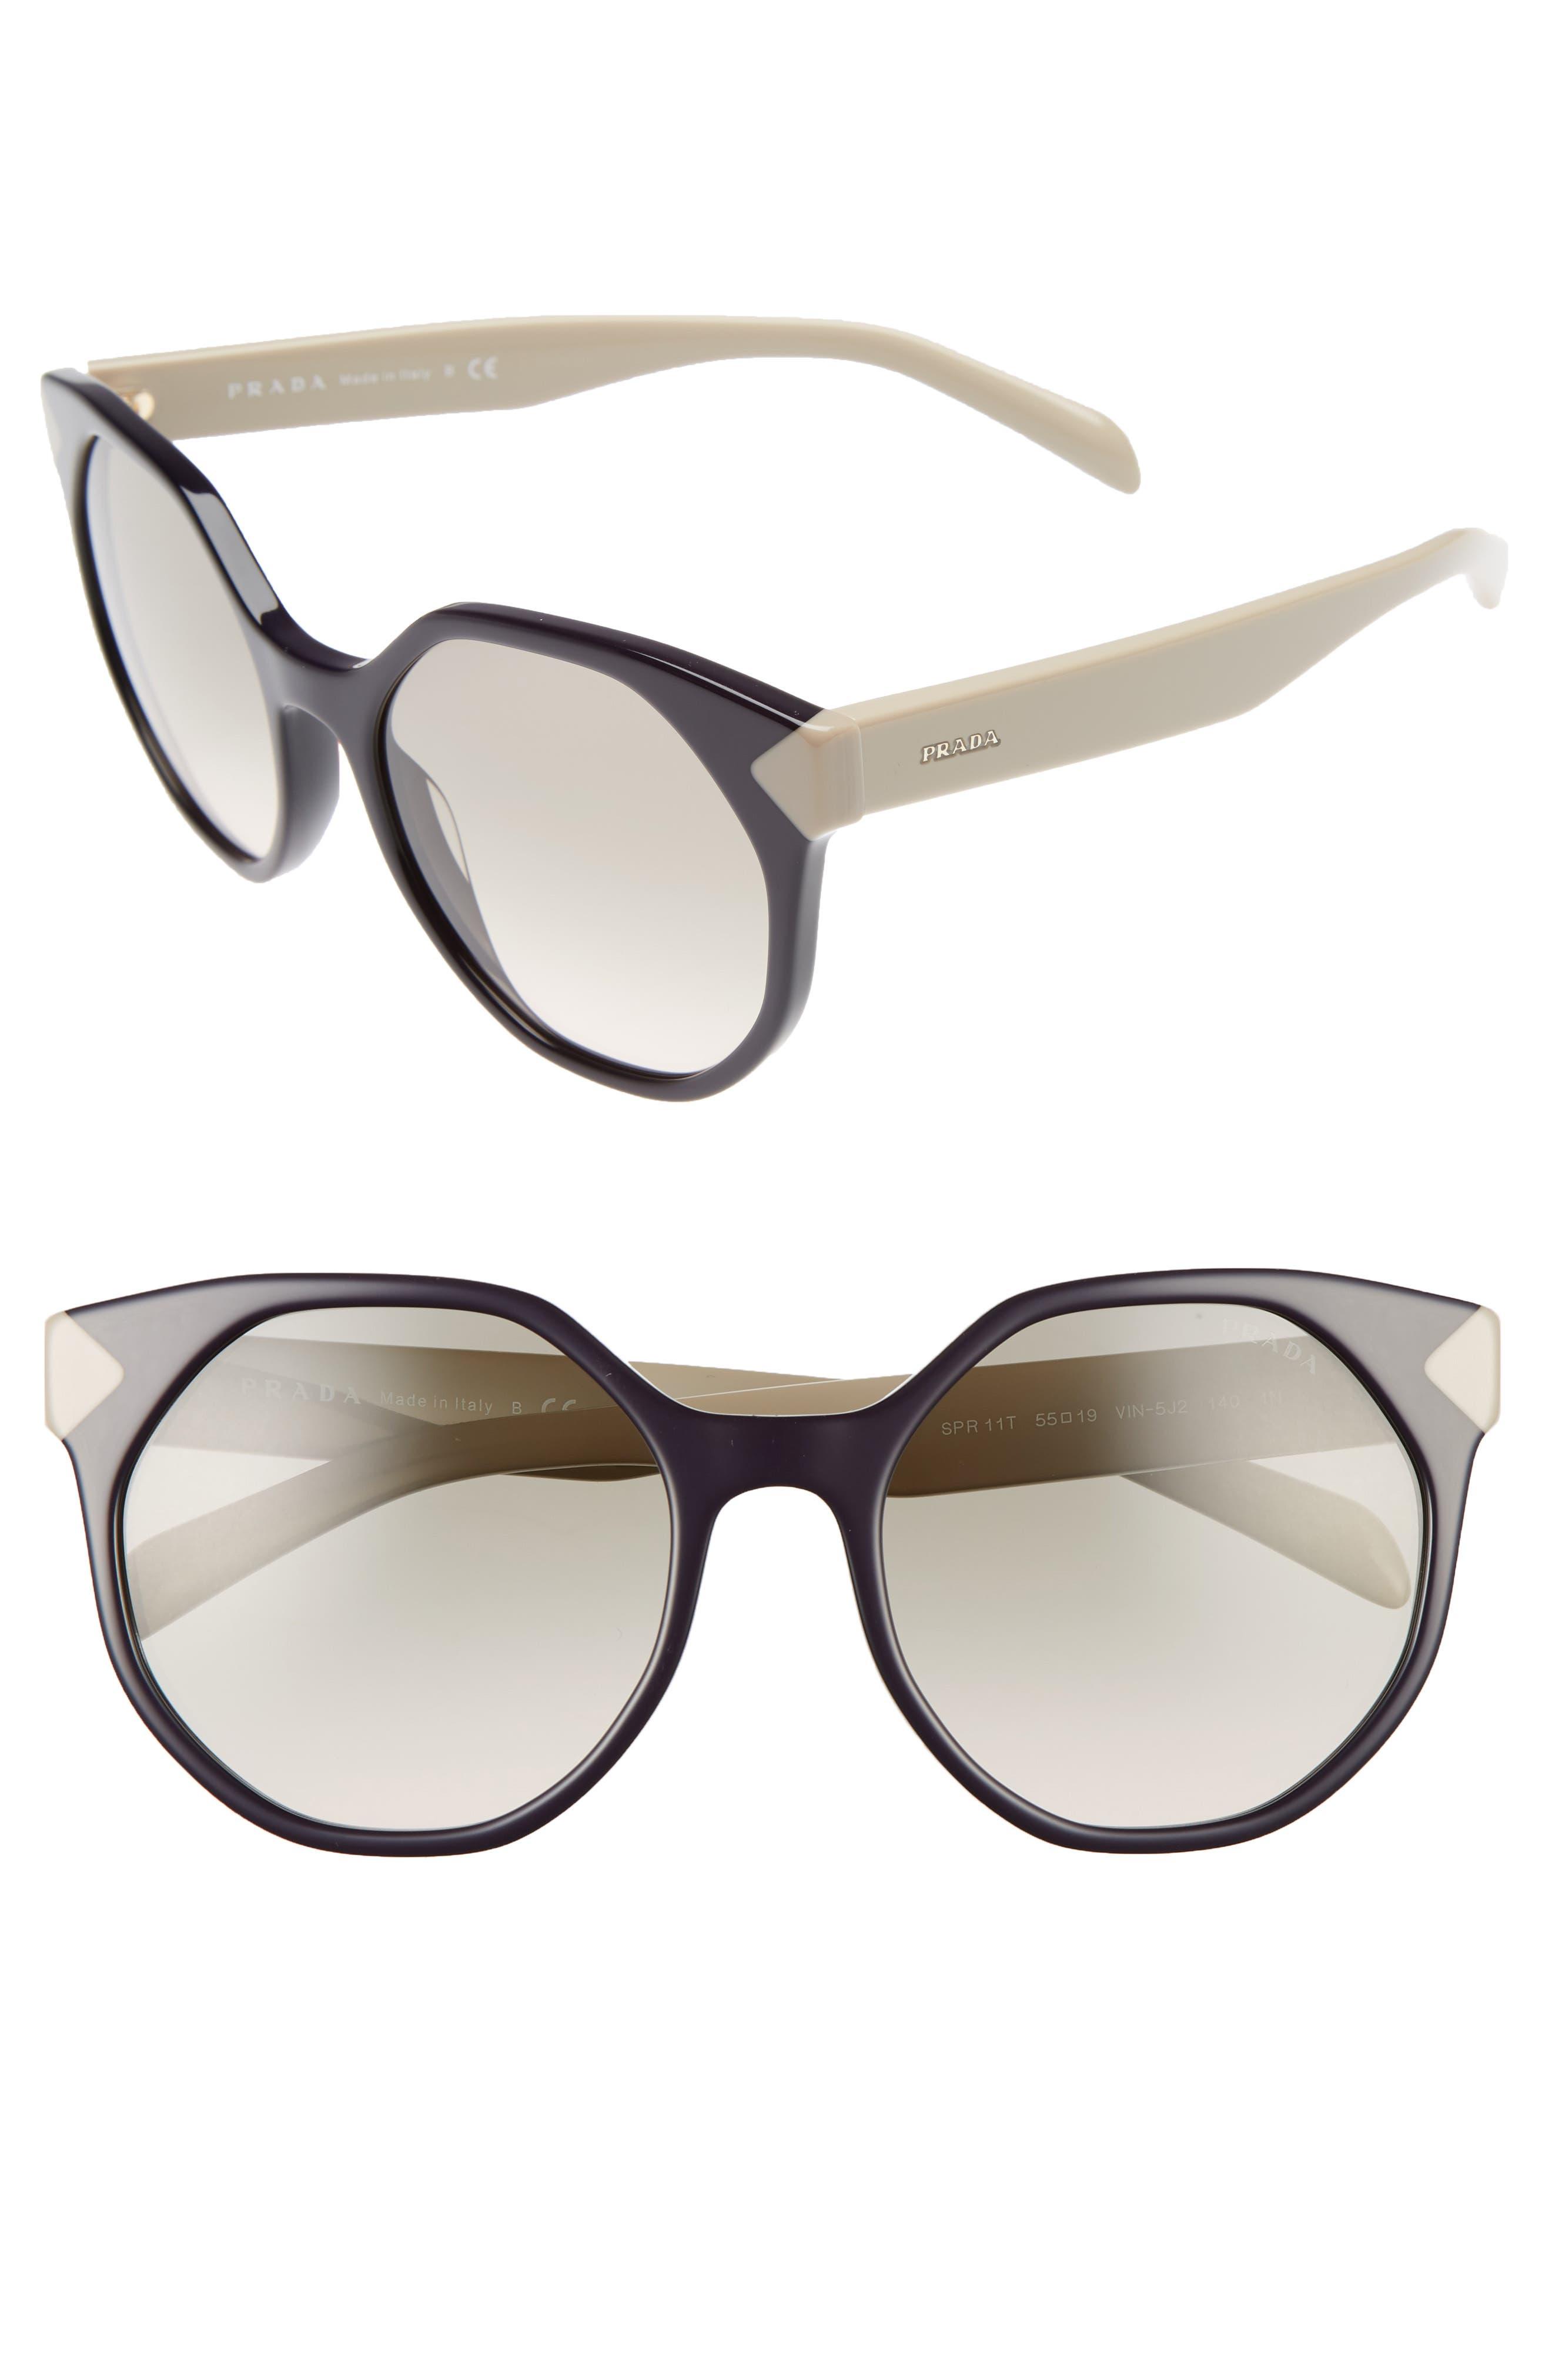 55mm Gradient Geometric Sunglasses,                             Main thumbnail 3, color,